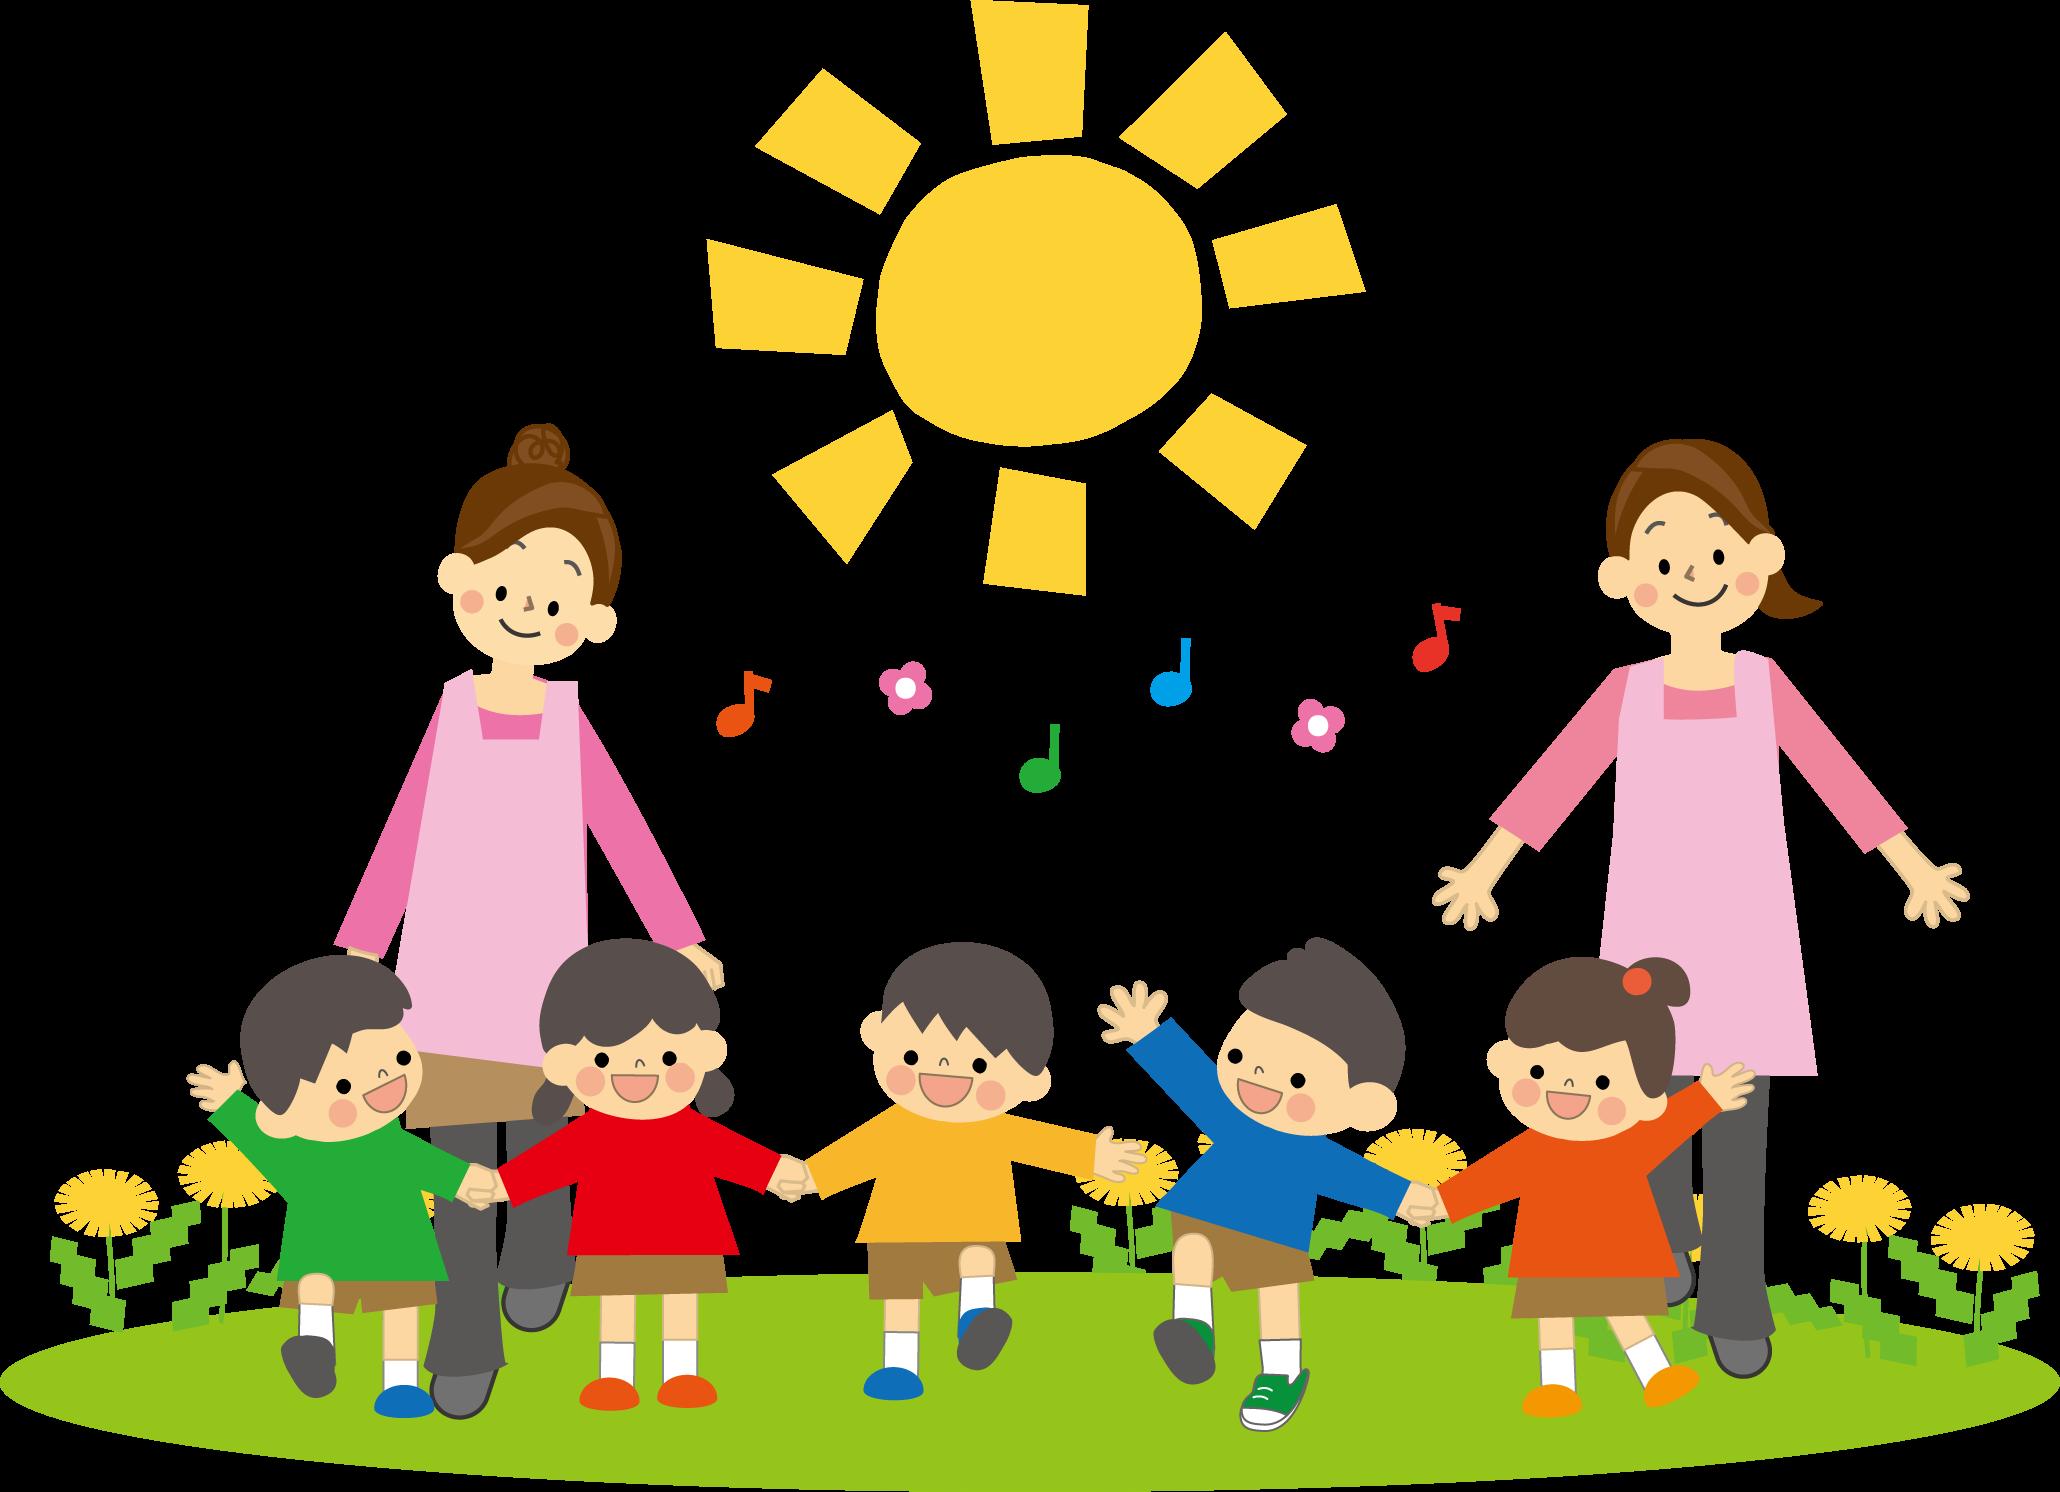 保育園と幼稚園児